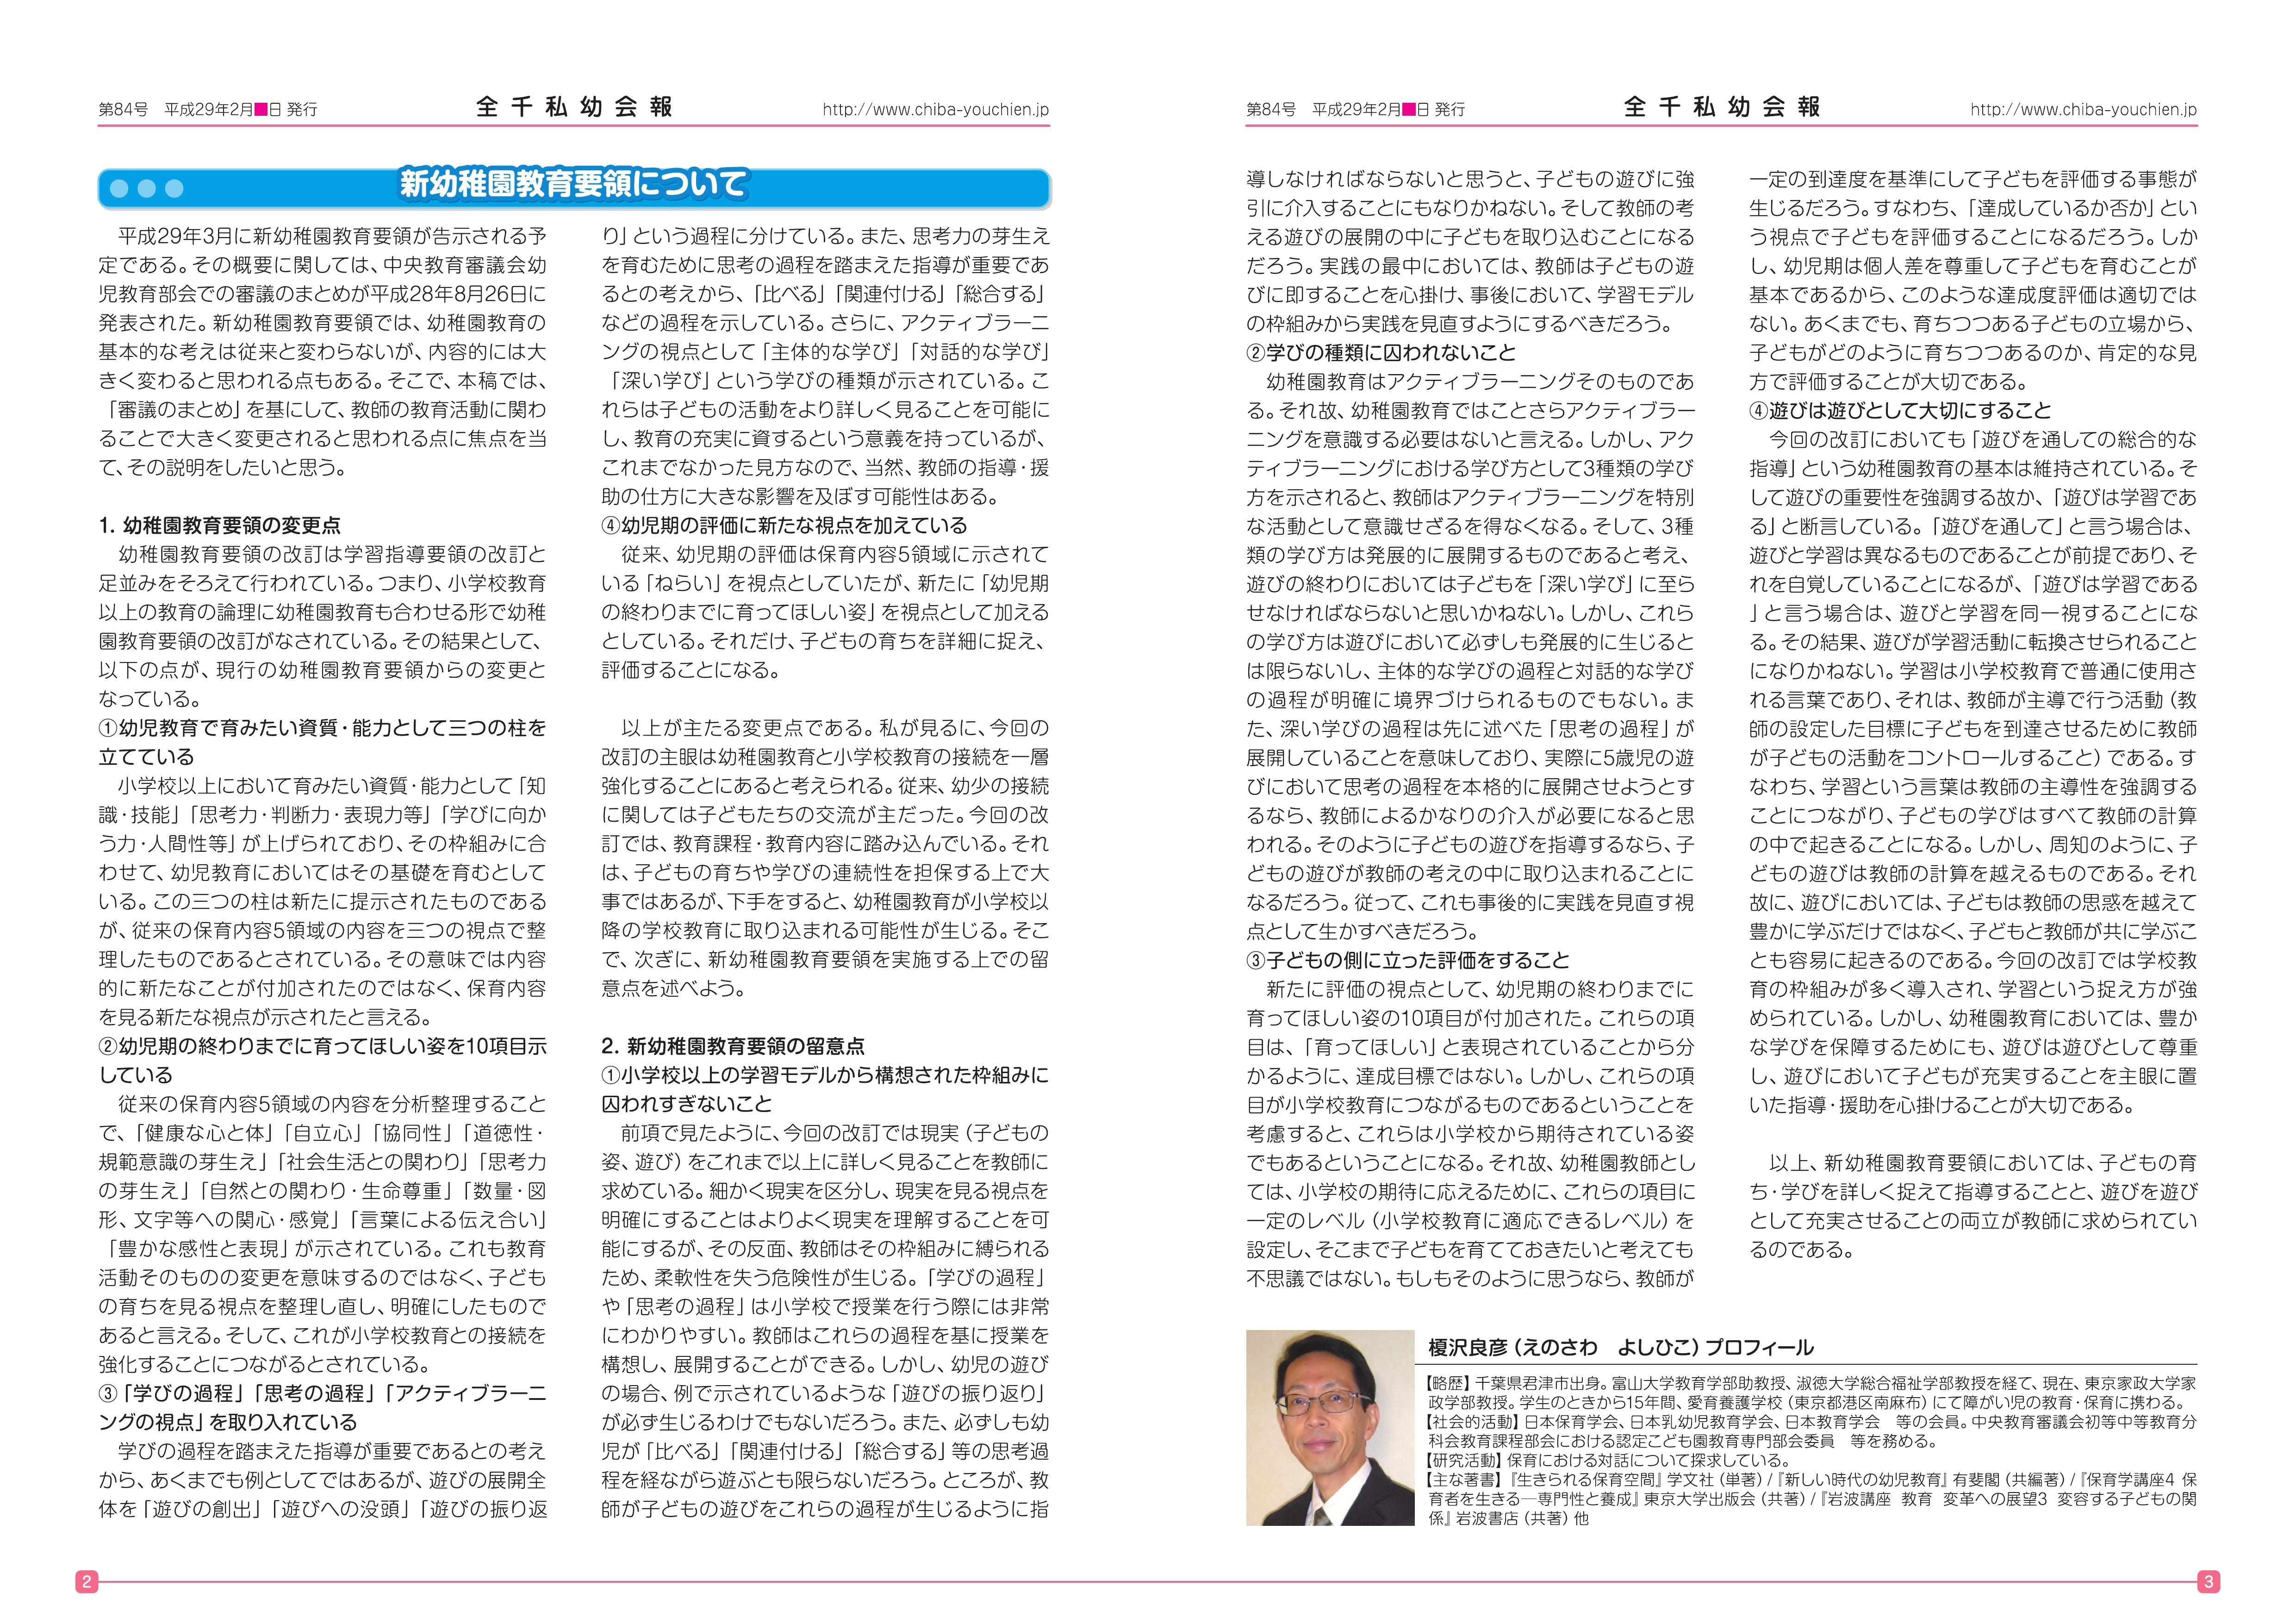 http://www.chiba-youchien.jp/news/84%E5%8F%B7P2_P3_0131.jpg